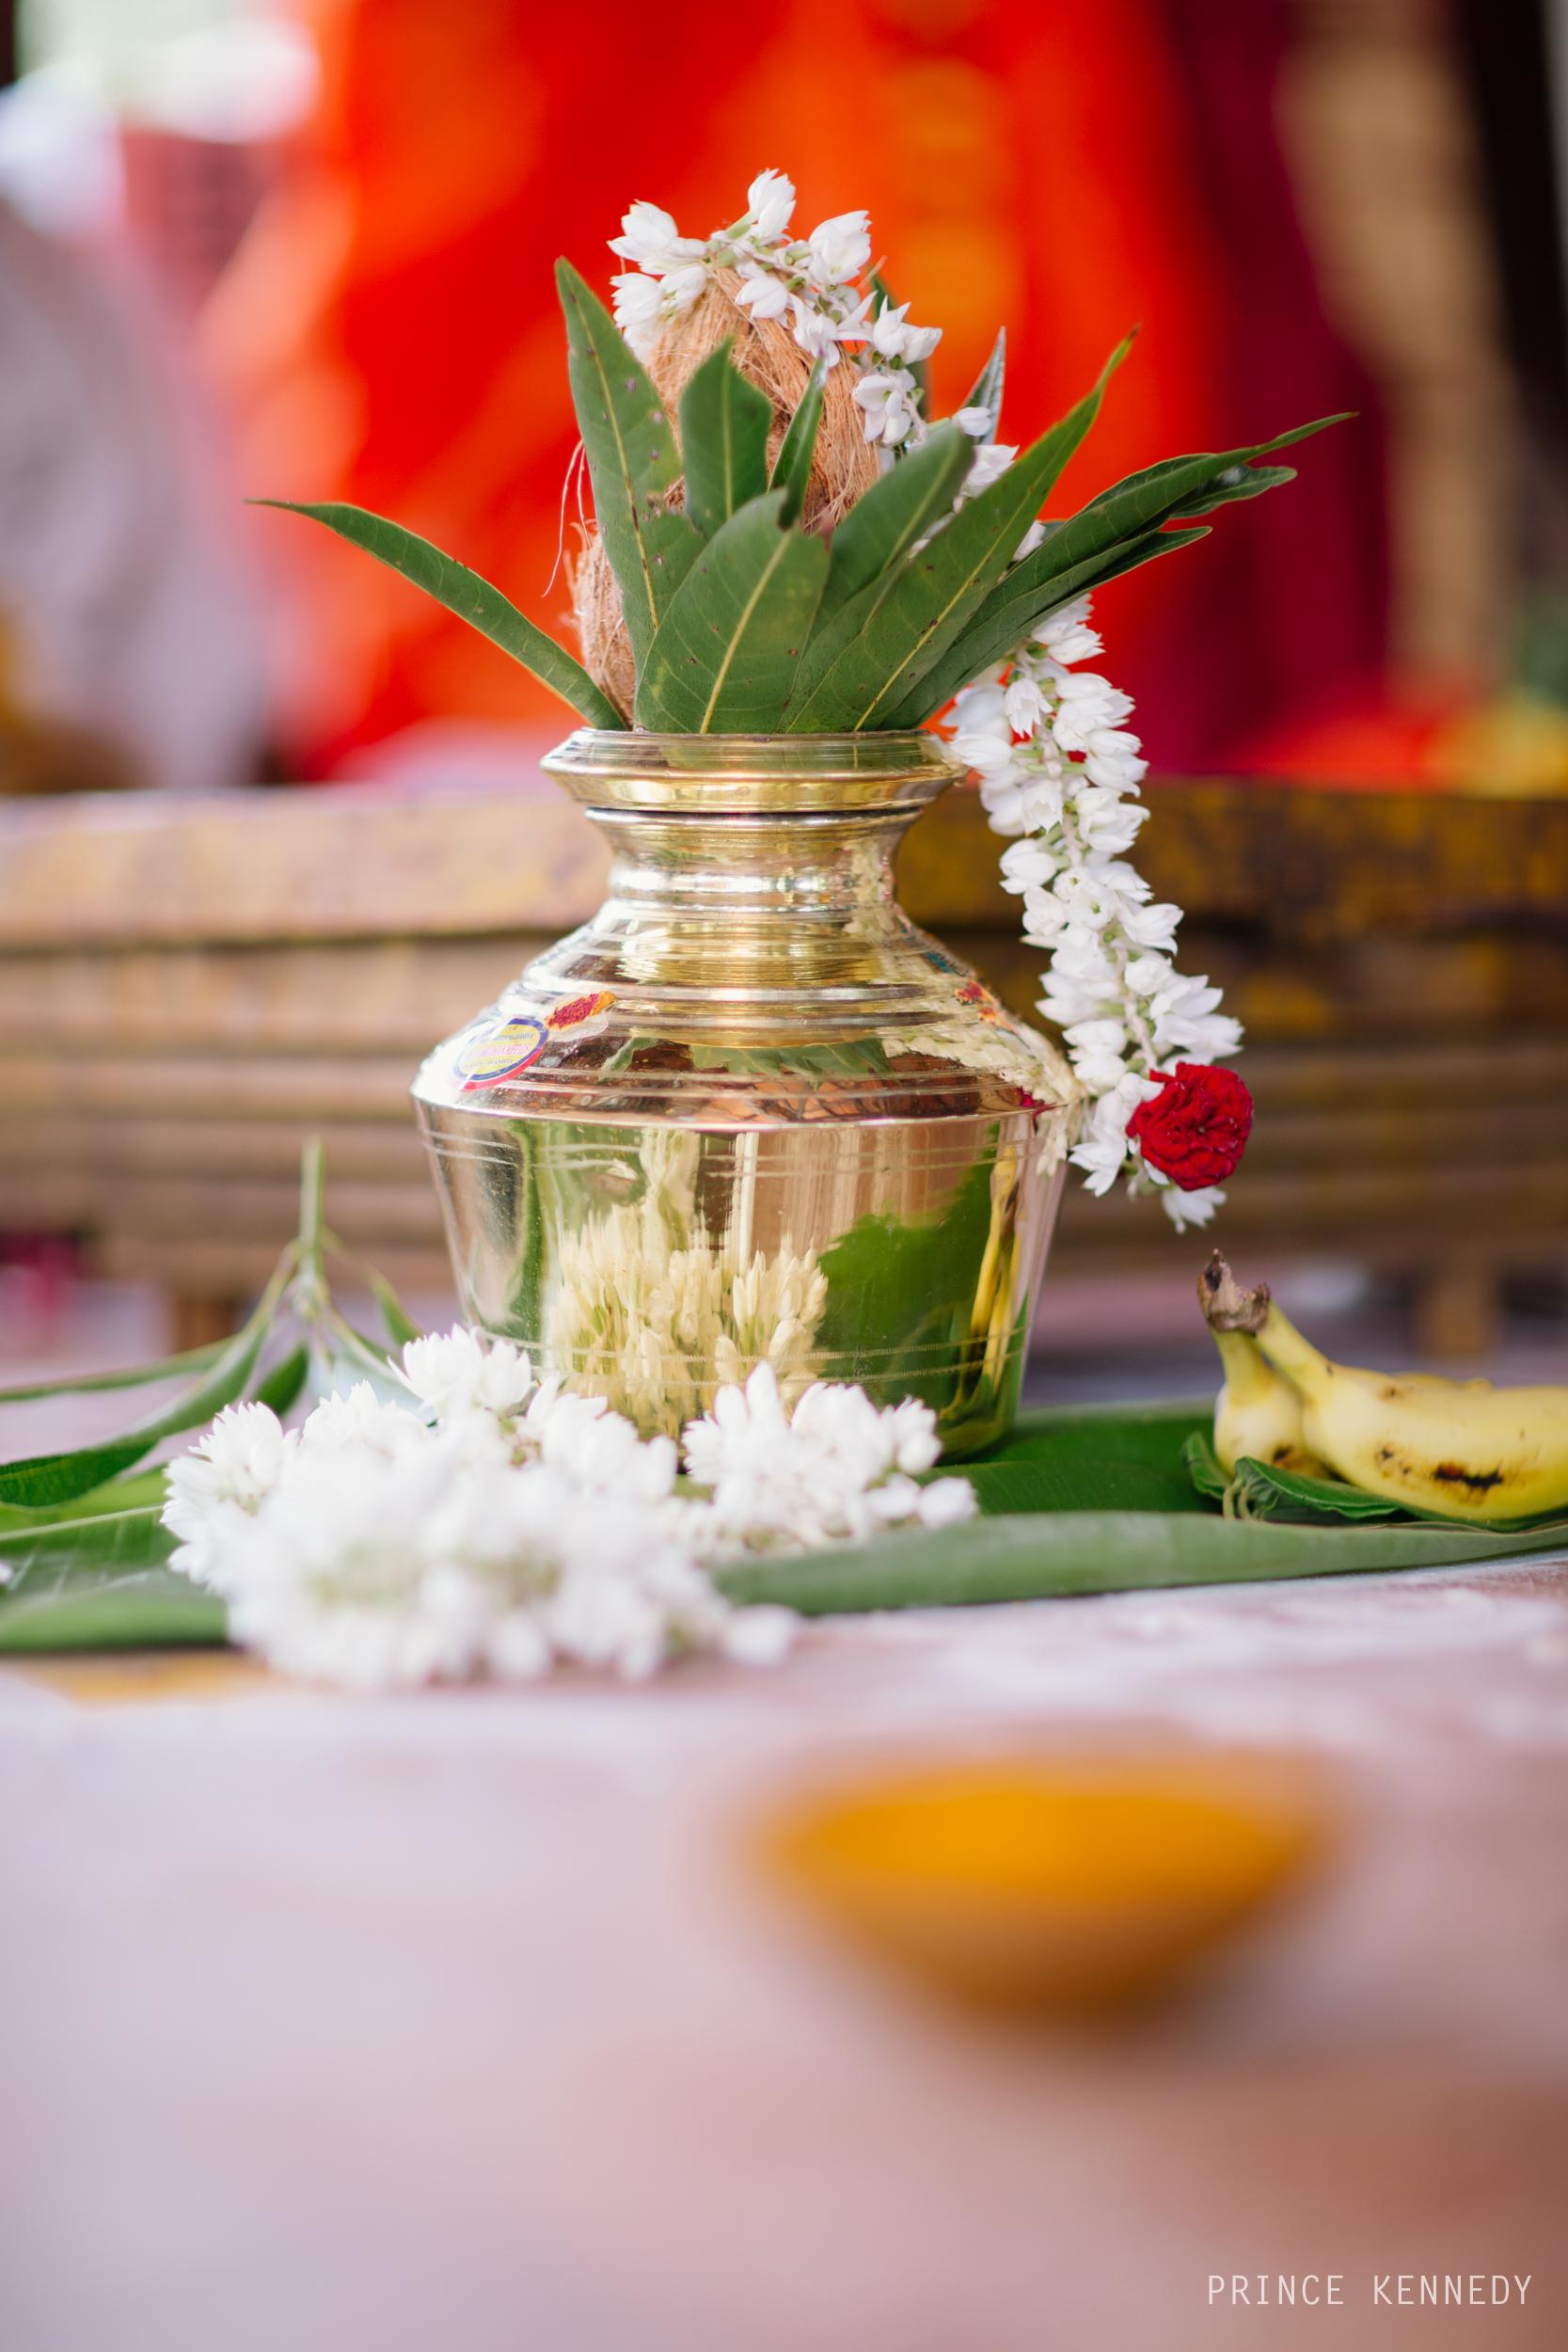 Athmajja-Nithesh-Engagement-Couple-Portrait-Portraiture-Wedding-Couple-Portrait-Chennai-Photographer-Candid-Photography-Destination-Best-Prince-Kennedy-Photography-205.jpg